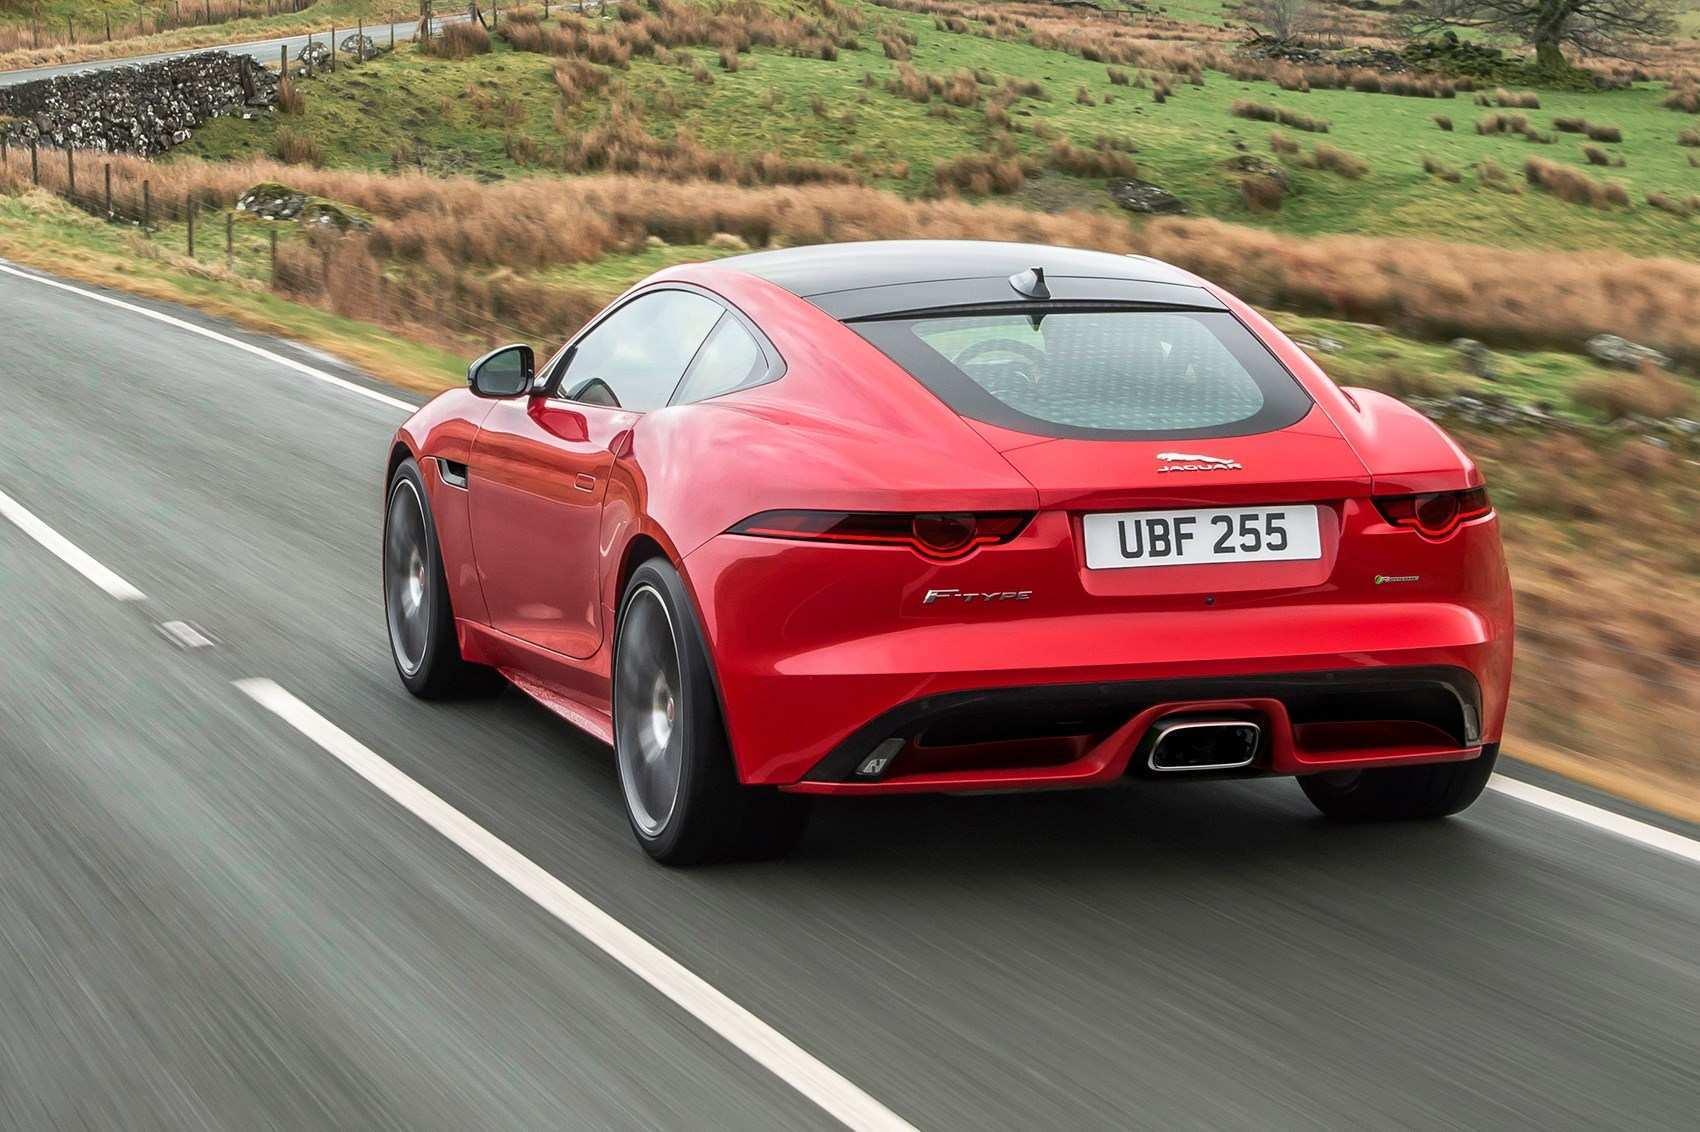 35 Concept of 2020 Jaguar J Type Redesign by 2020 Jaguar J Type